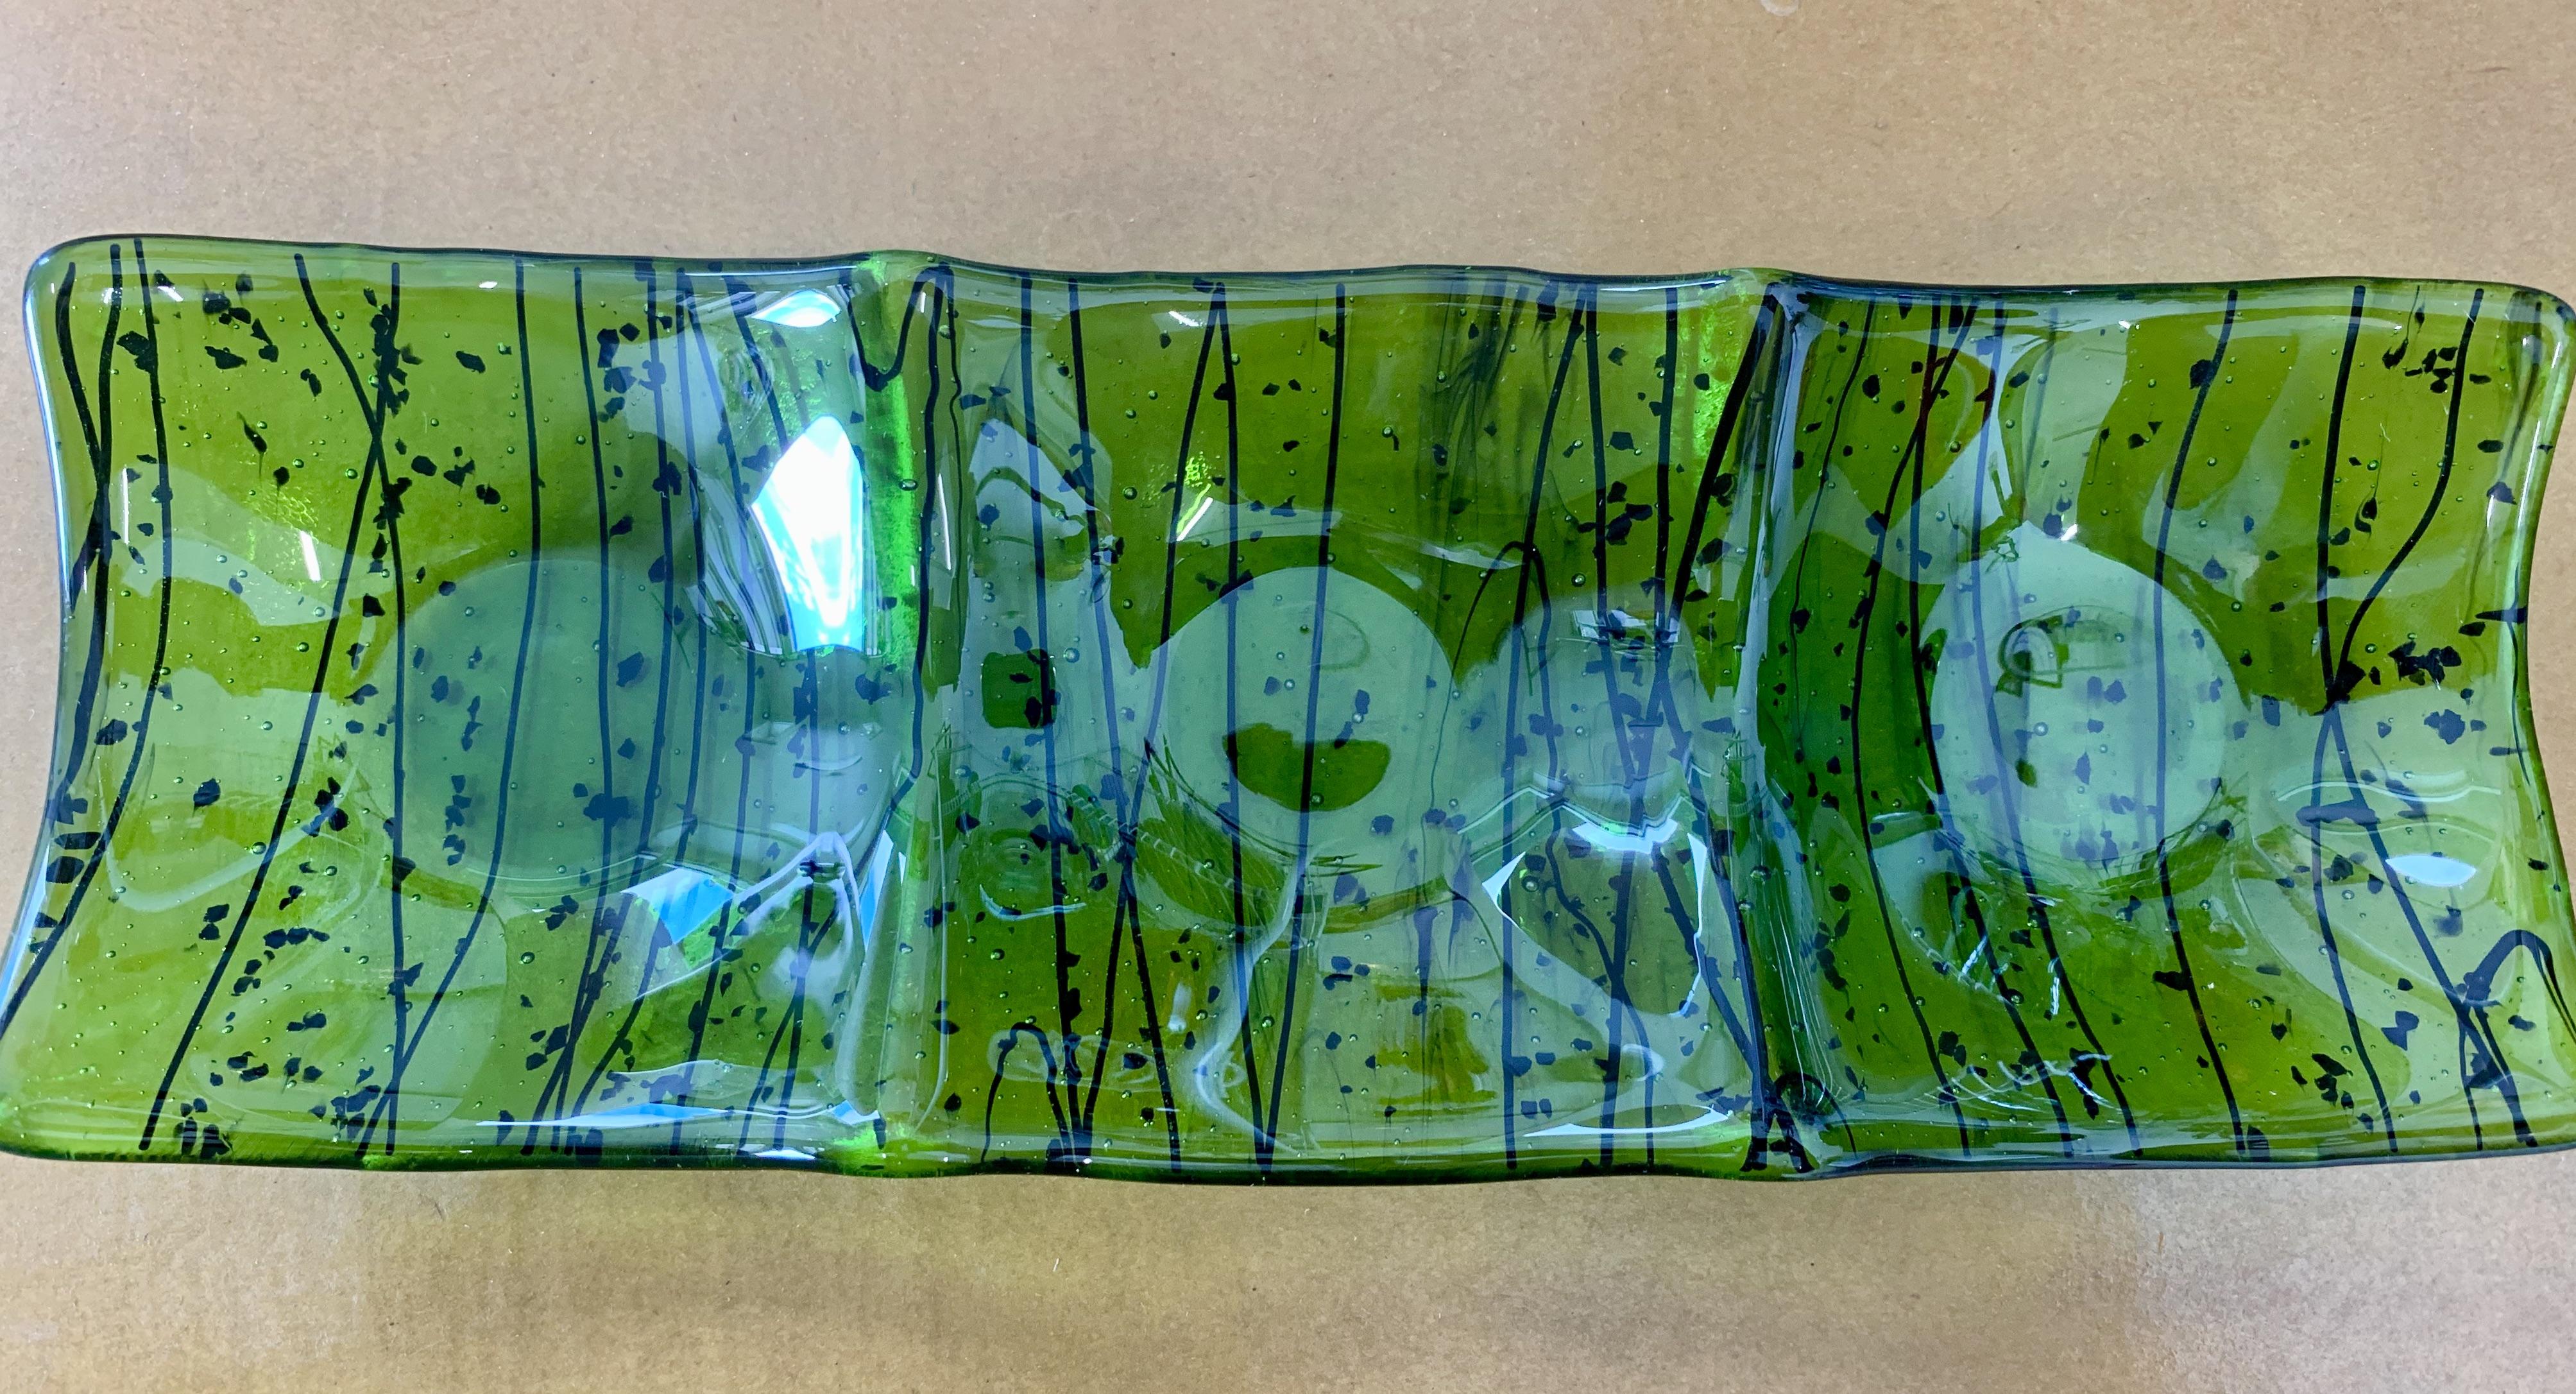 Transparent Plate - $50